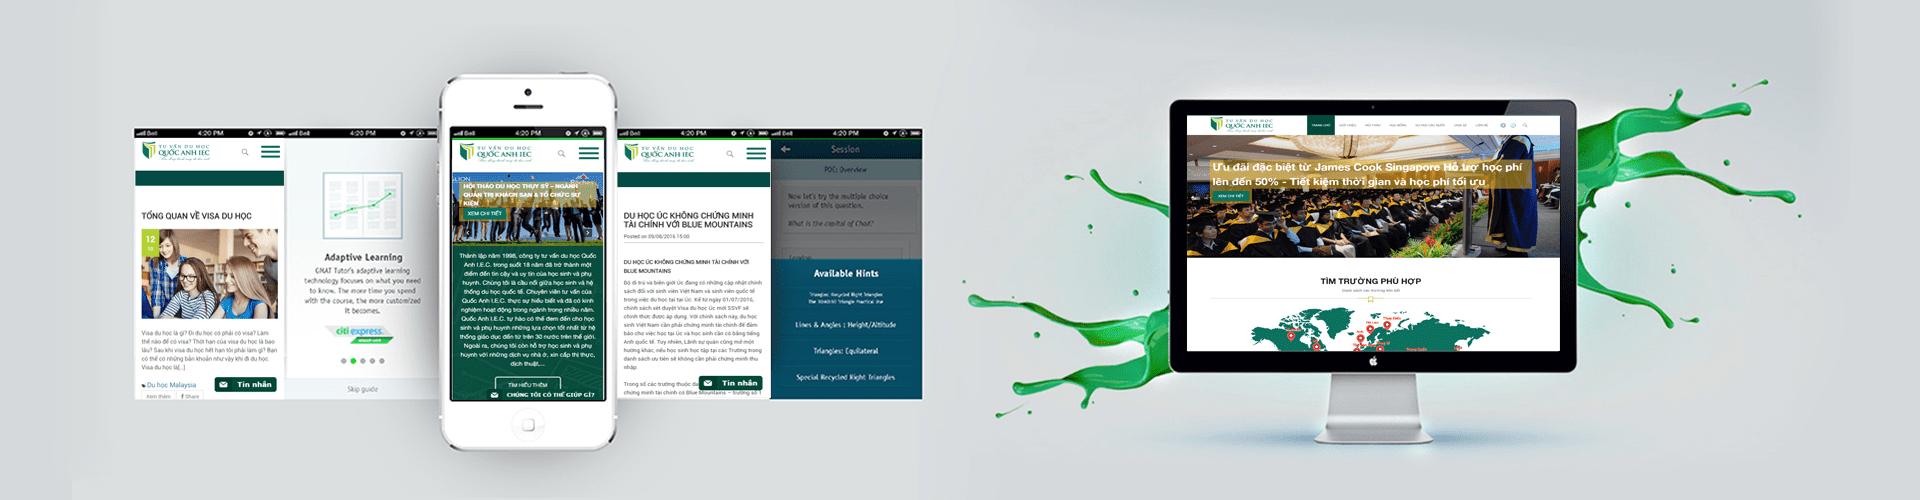 Thiết kế website du học QUỐC ANH IEC